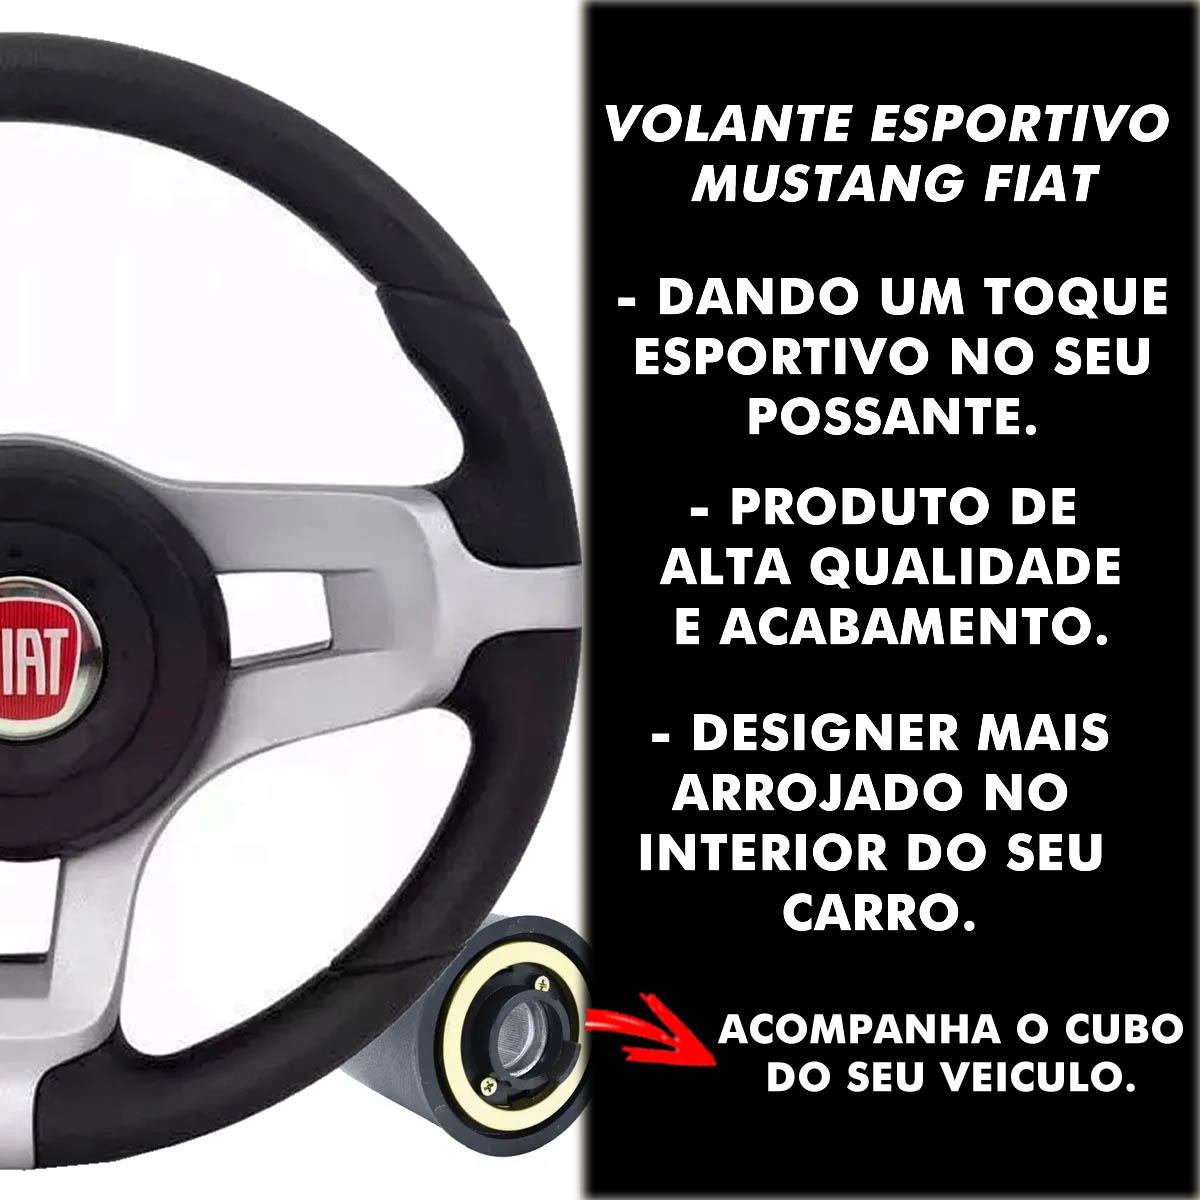 Volante Fiat Mustang Esportivo Cubo Palio Uno 1983 a 2013 Siena Strada Stilo Punto Idea Poliparts